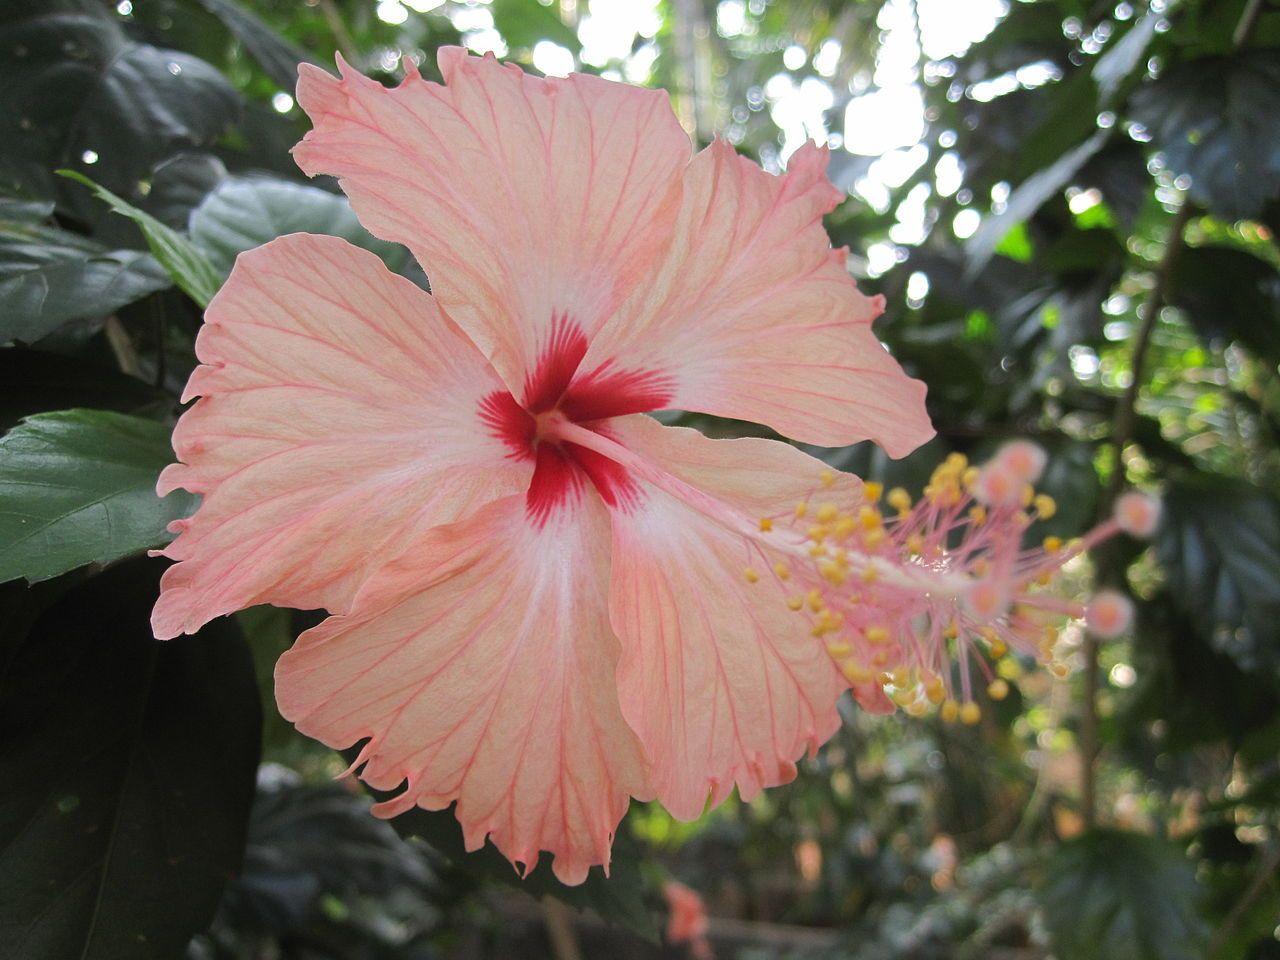 Hibiscus From Kerala India 05 Hibiscus Wikipedia Hibiscus Showy Flowers Flowers